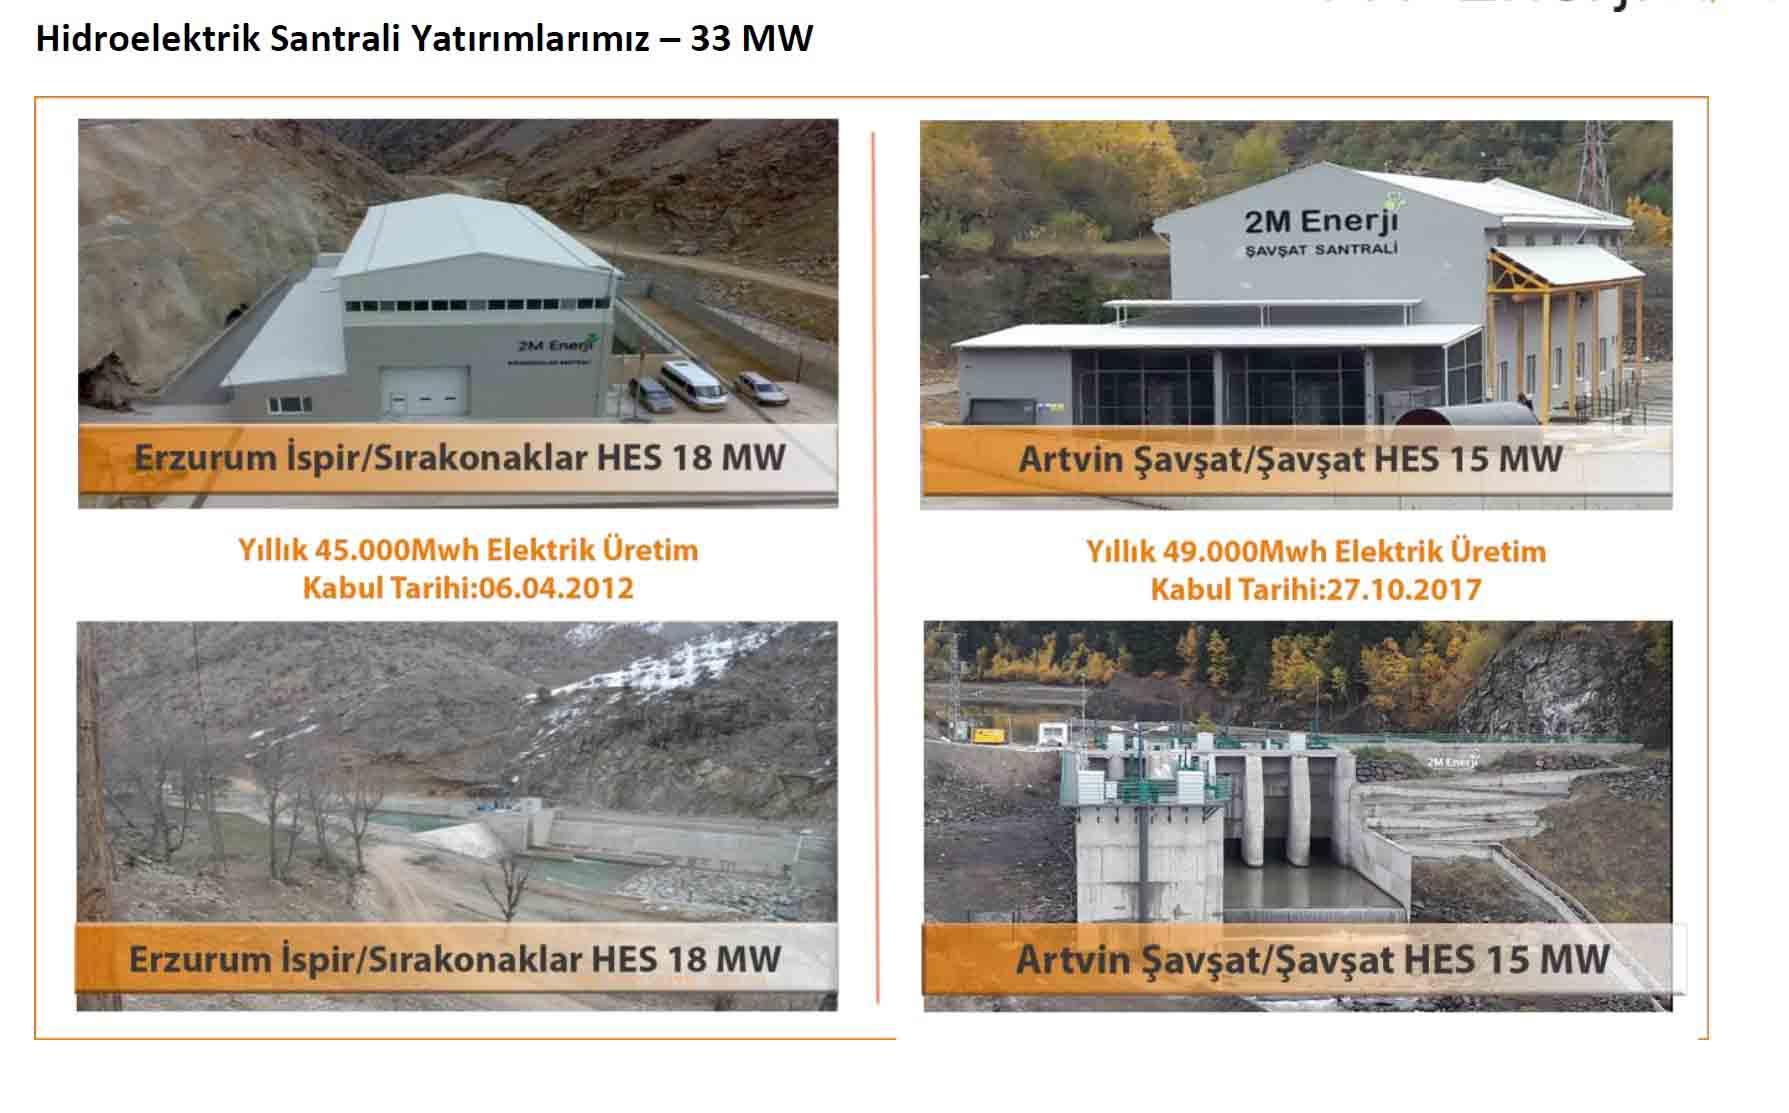 Hidroelektrik Santrali Referansları